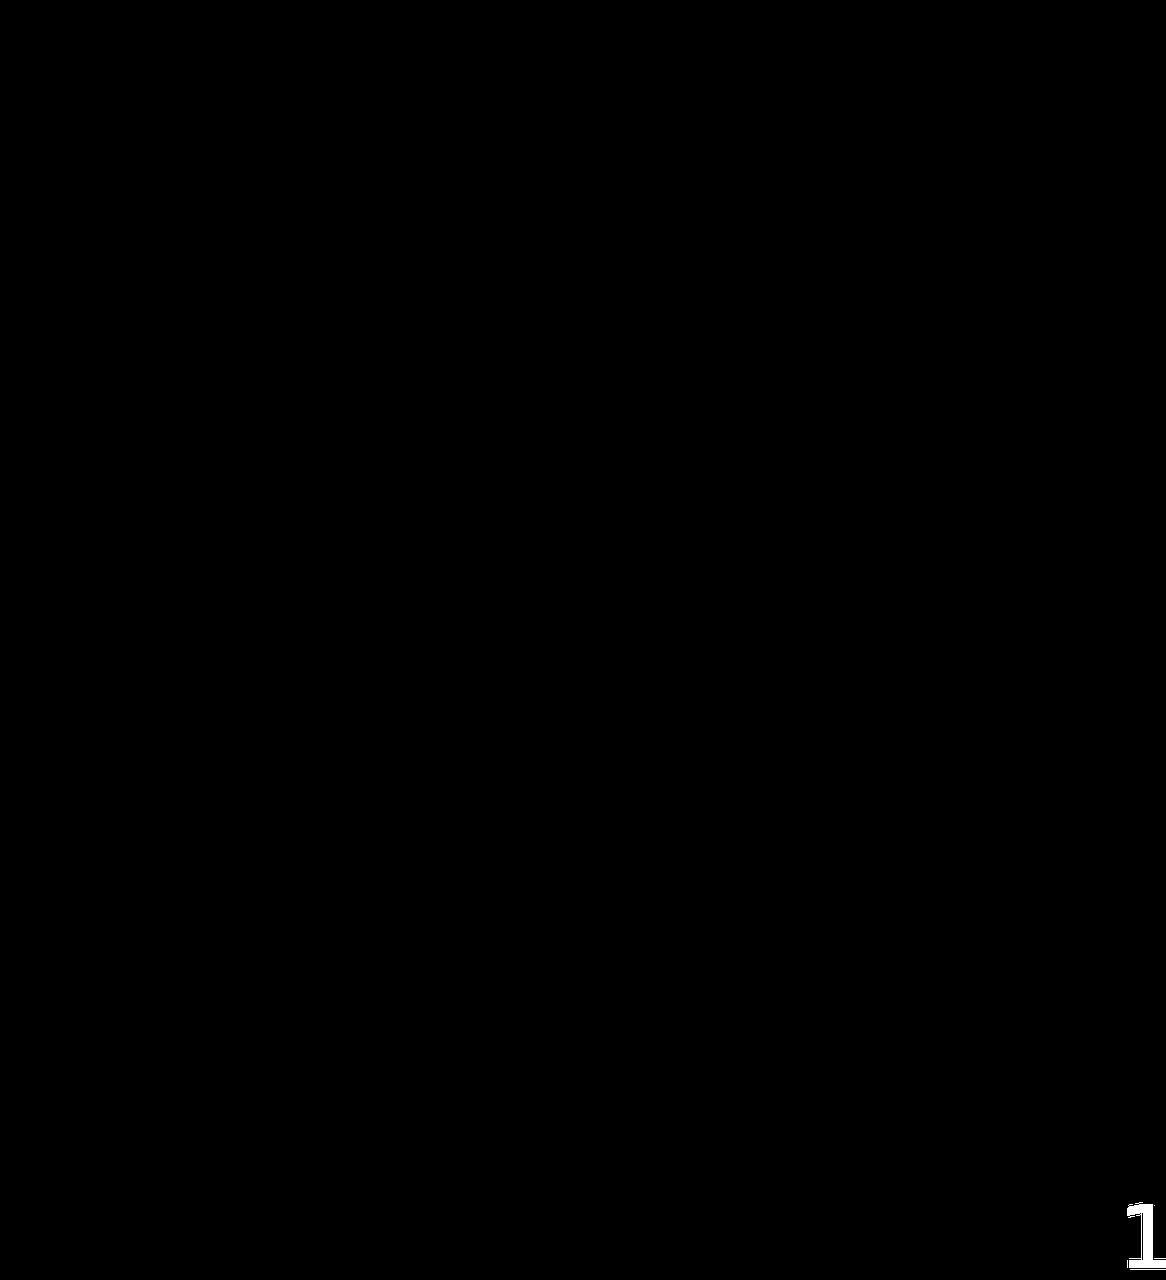 Kostenloses Bild Auf Pixabay Baum Silhouette Schwarz Tree Drawing Oak Tree Drawings Tree Silhouette